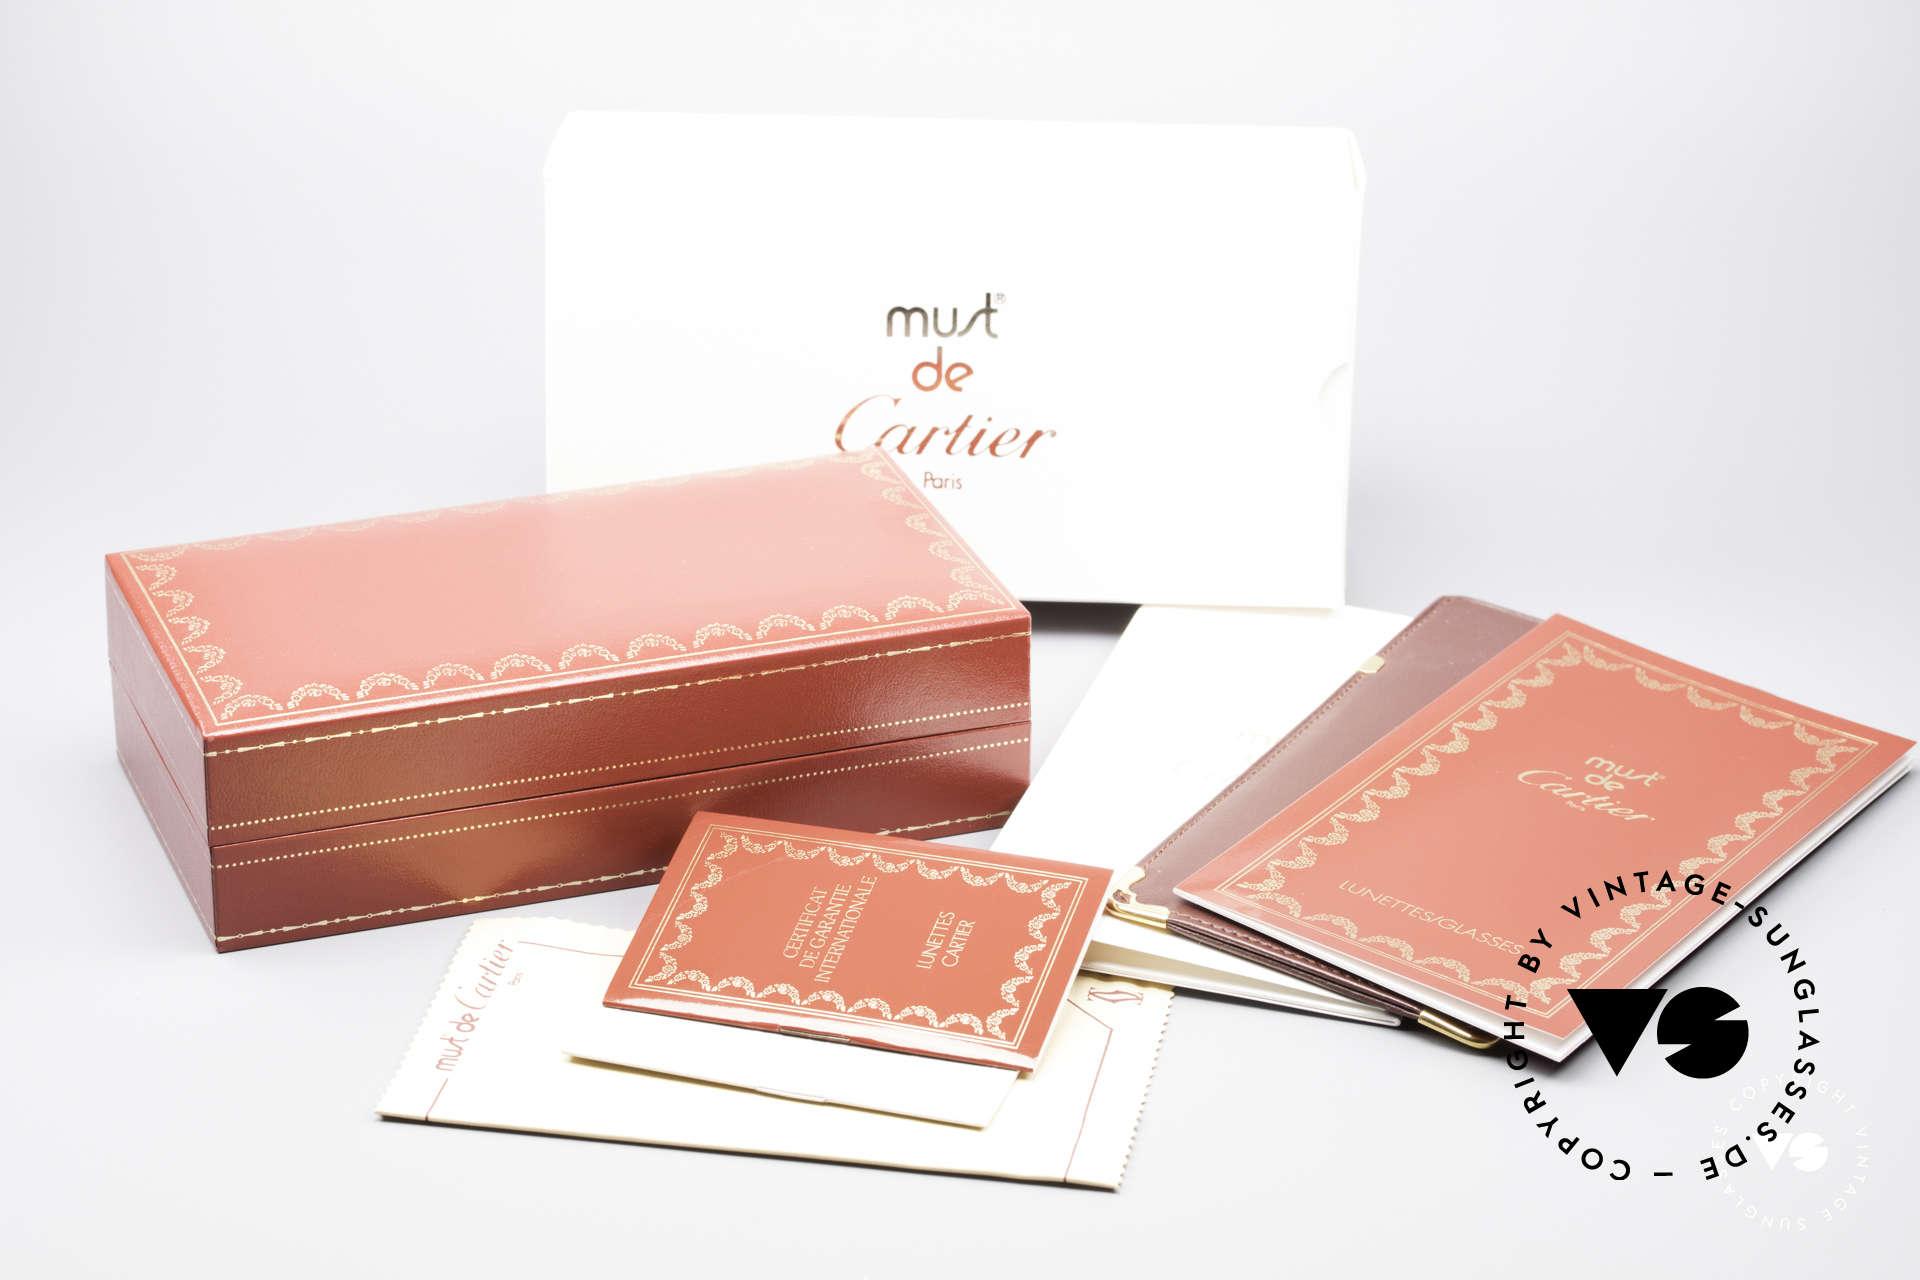 Cartier Vendome Laque - L Luxury 80's Aviator Shades, NO retro sunglasses, but an authentic vintage ORIGINAL, Made for Men